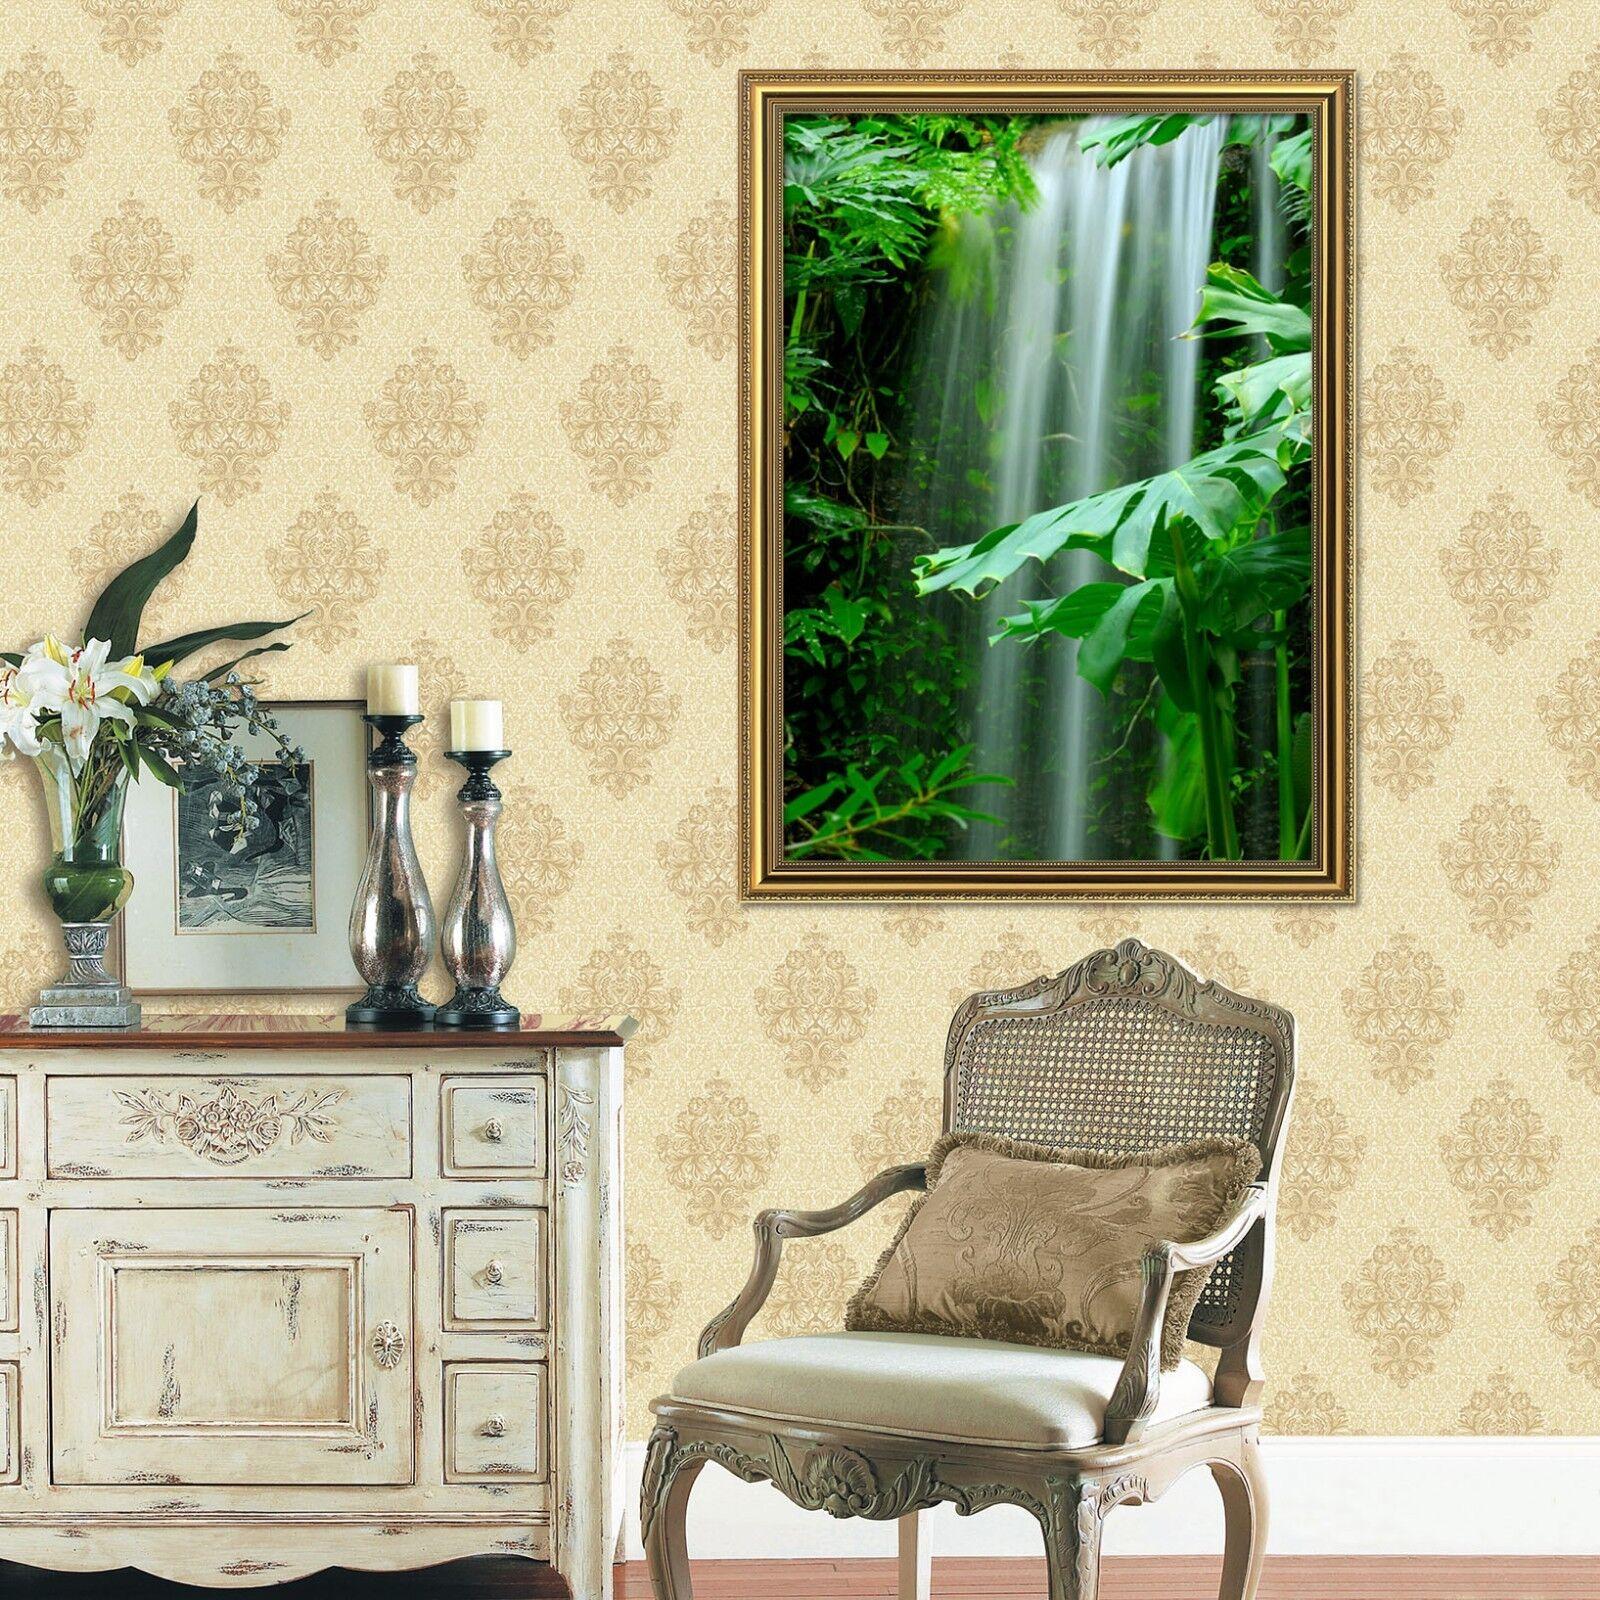 3D Forest Waterfall 5 Póster Enmarcado Decoración del Hogar Pintura de Impresión Arte AJ